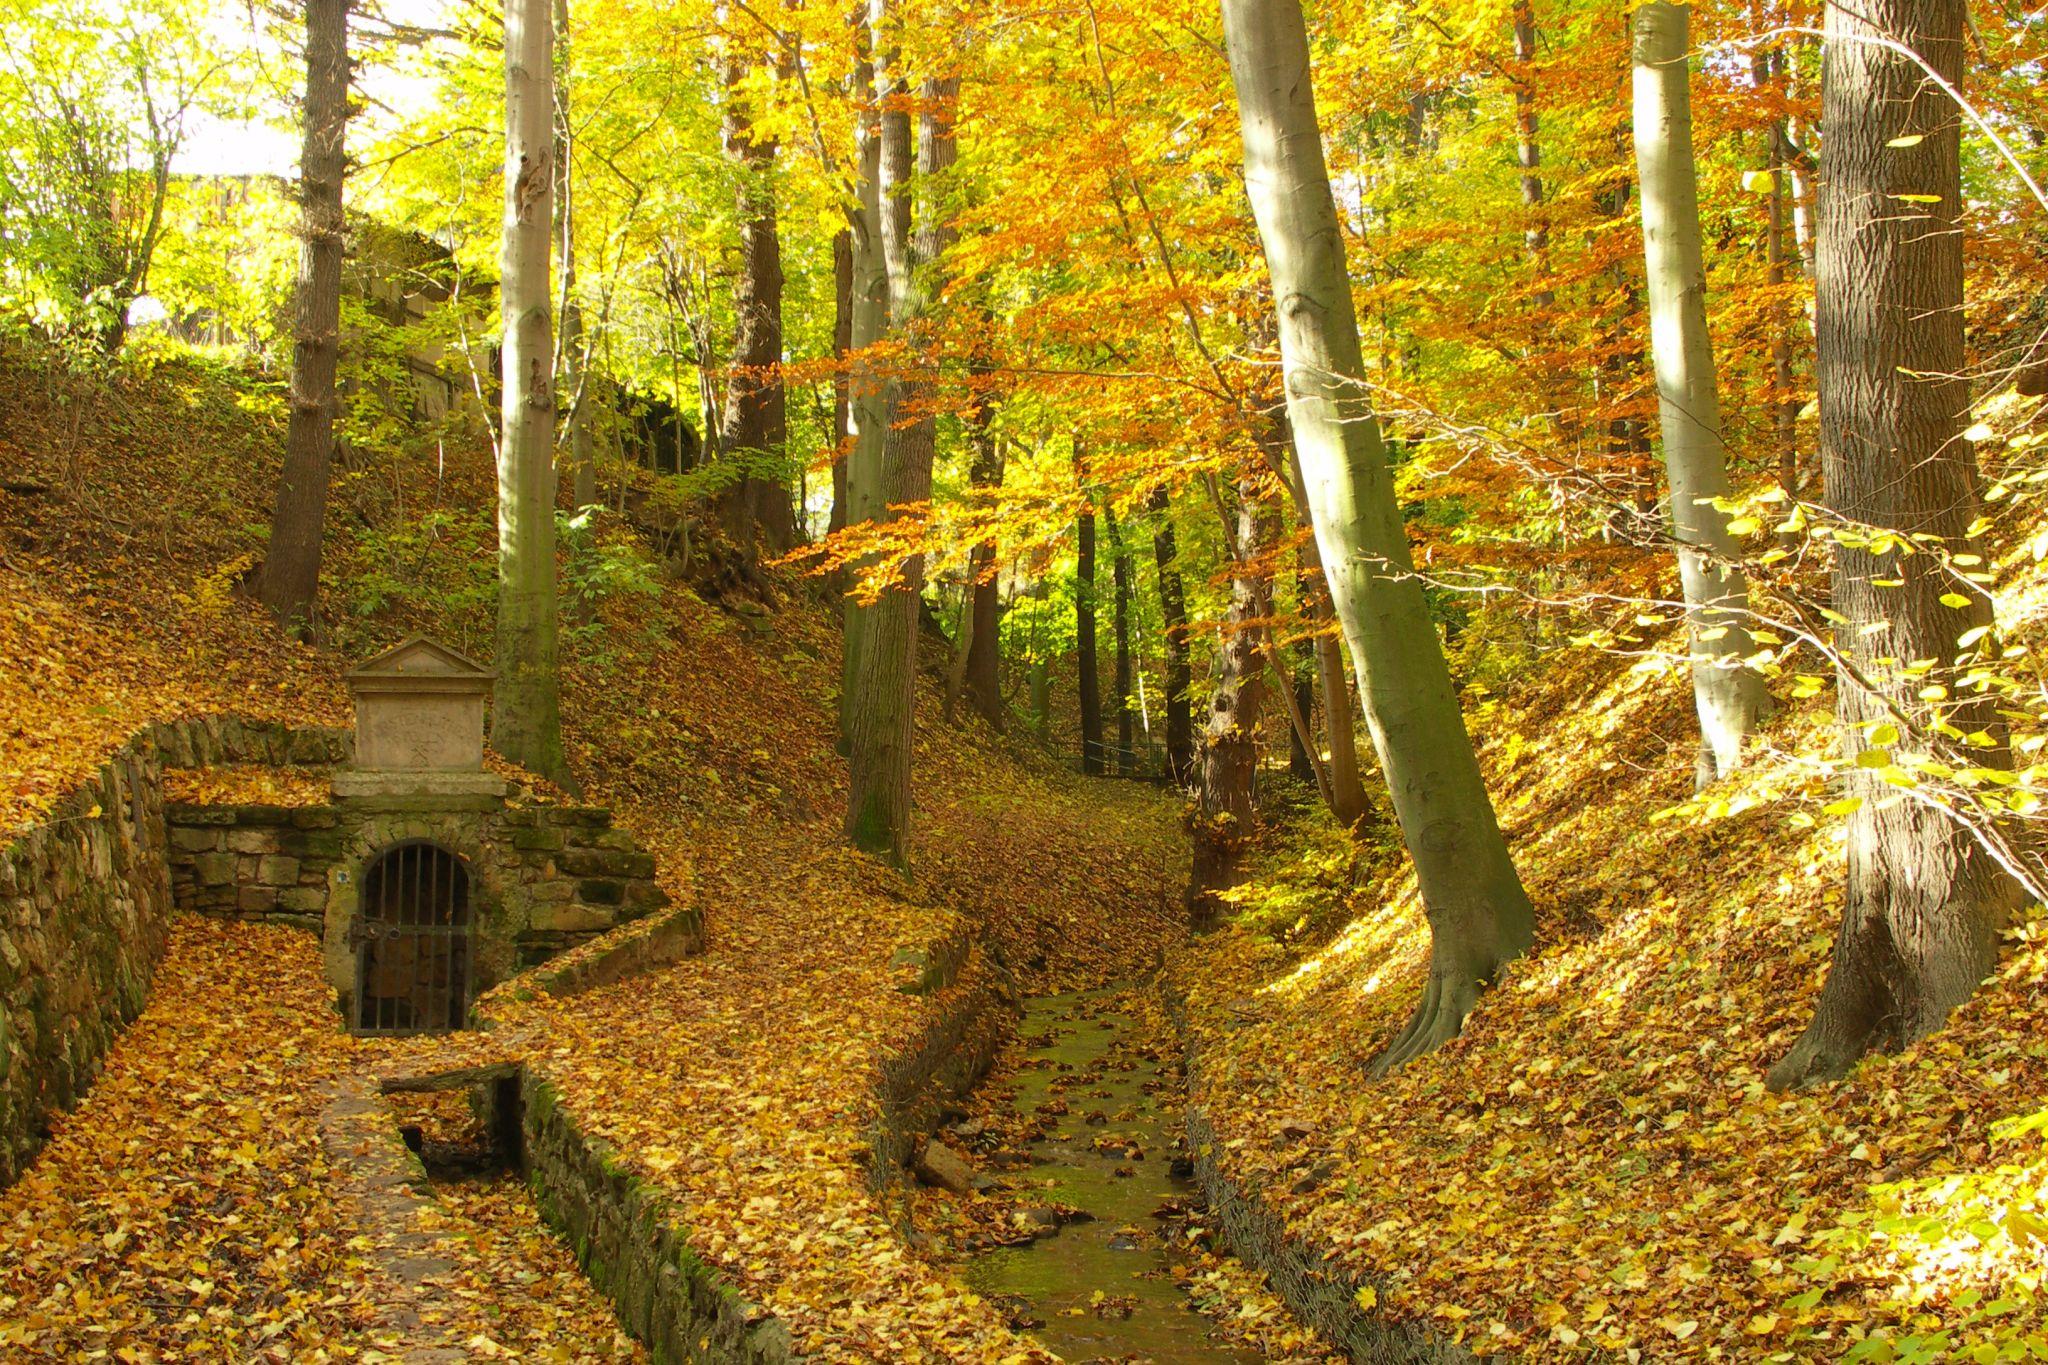 Siechenbach Tal, Germany